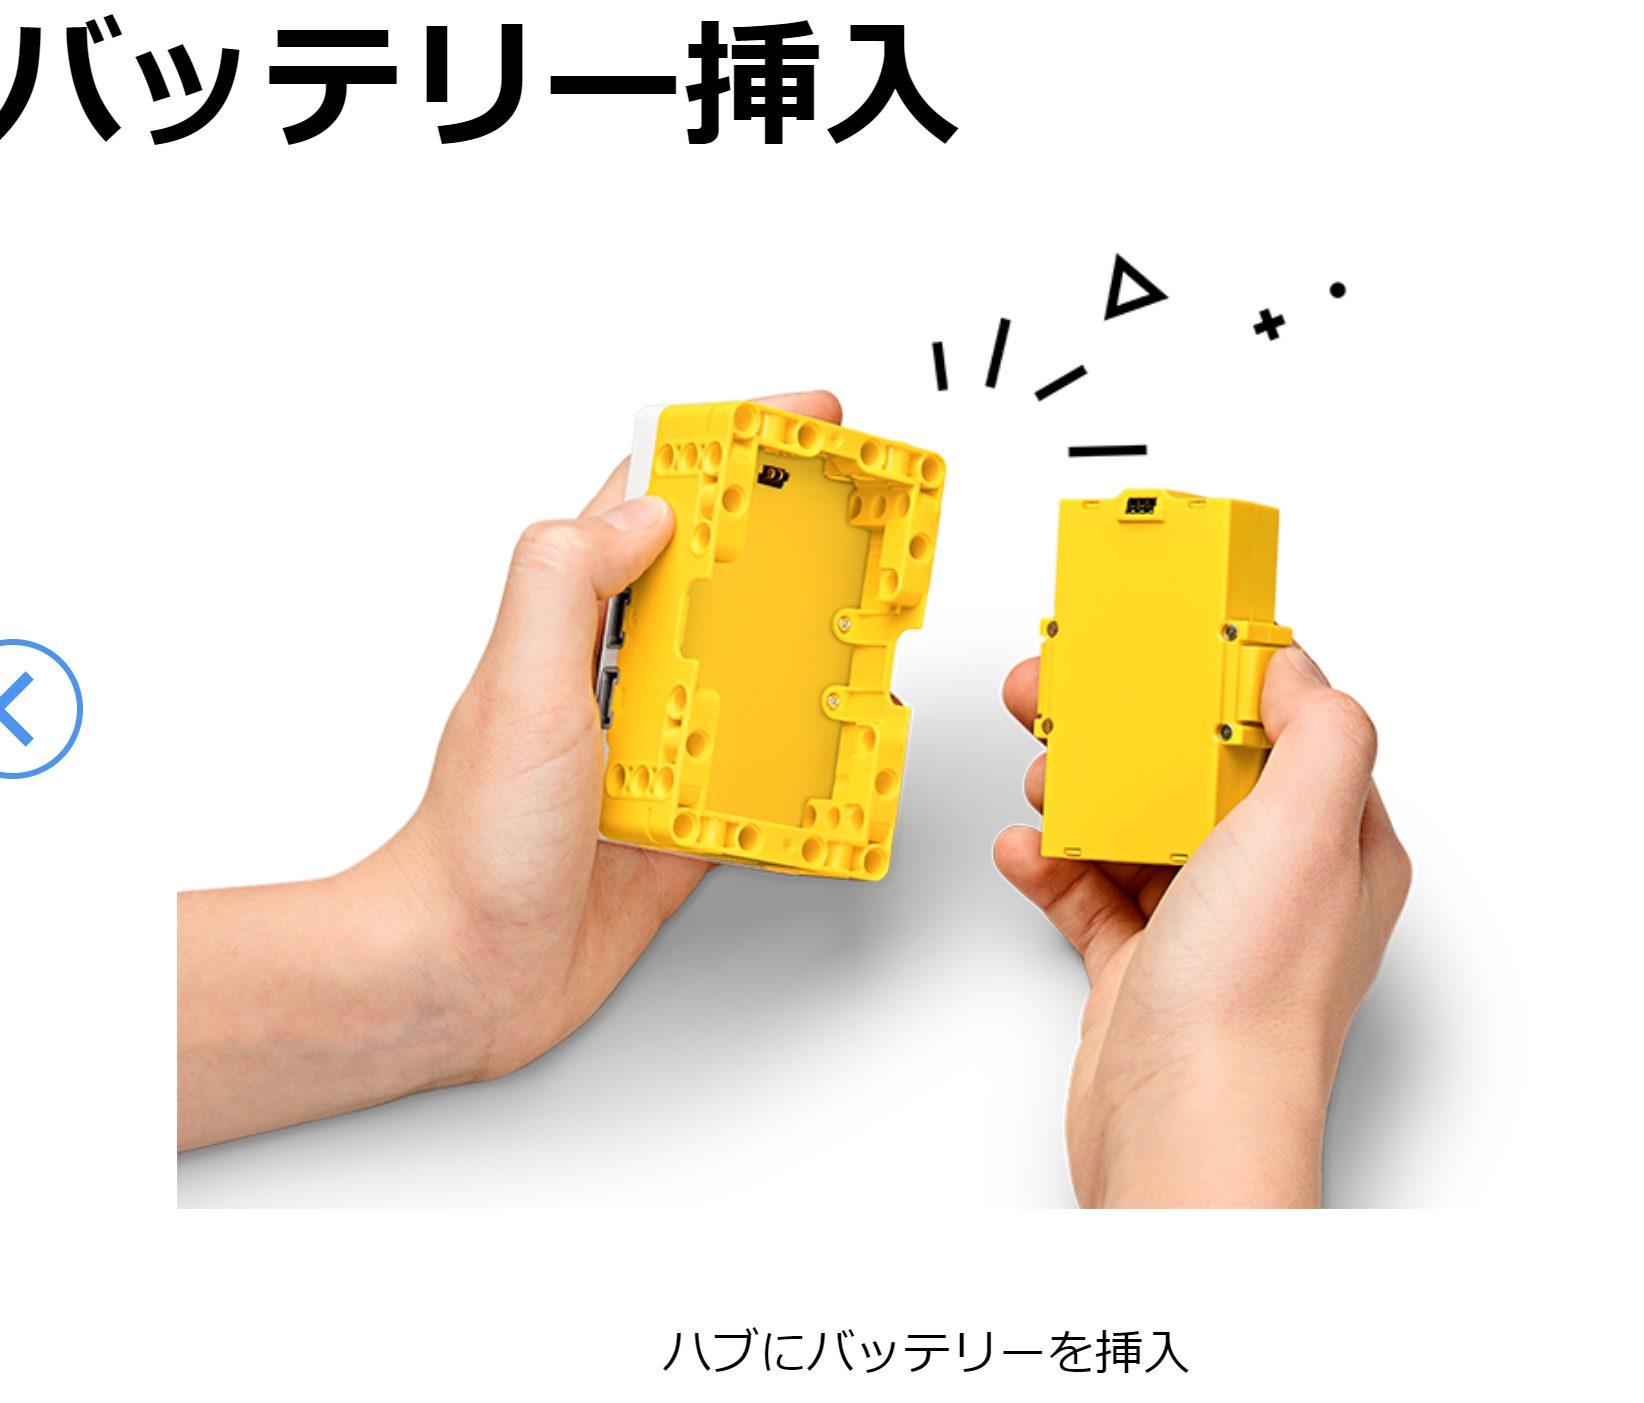 【#3】SPIKEをデバイスに接続しよう